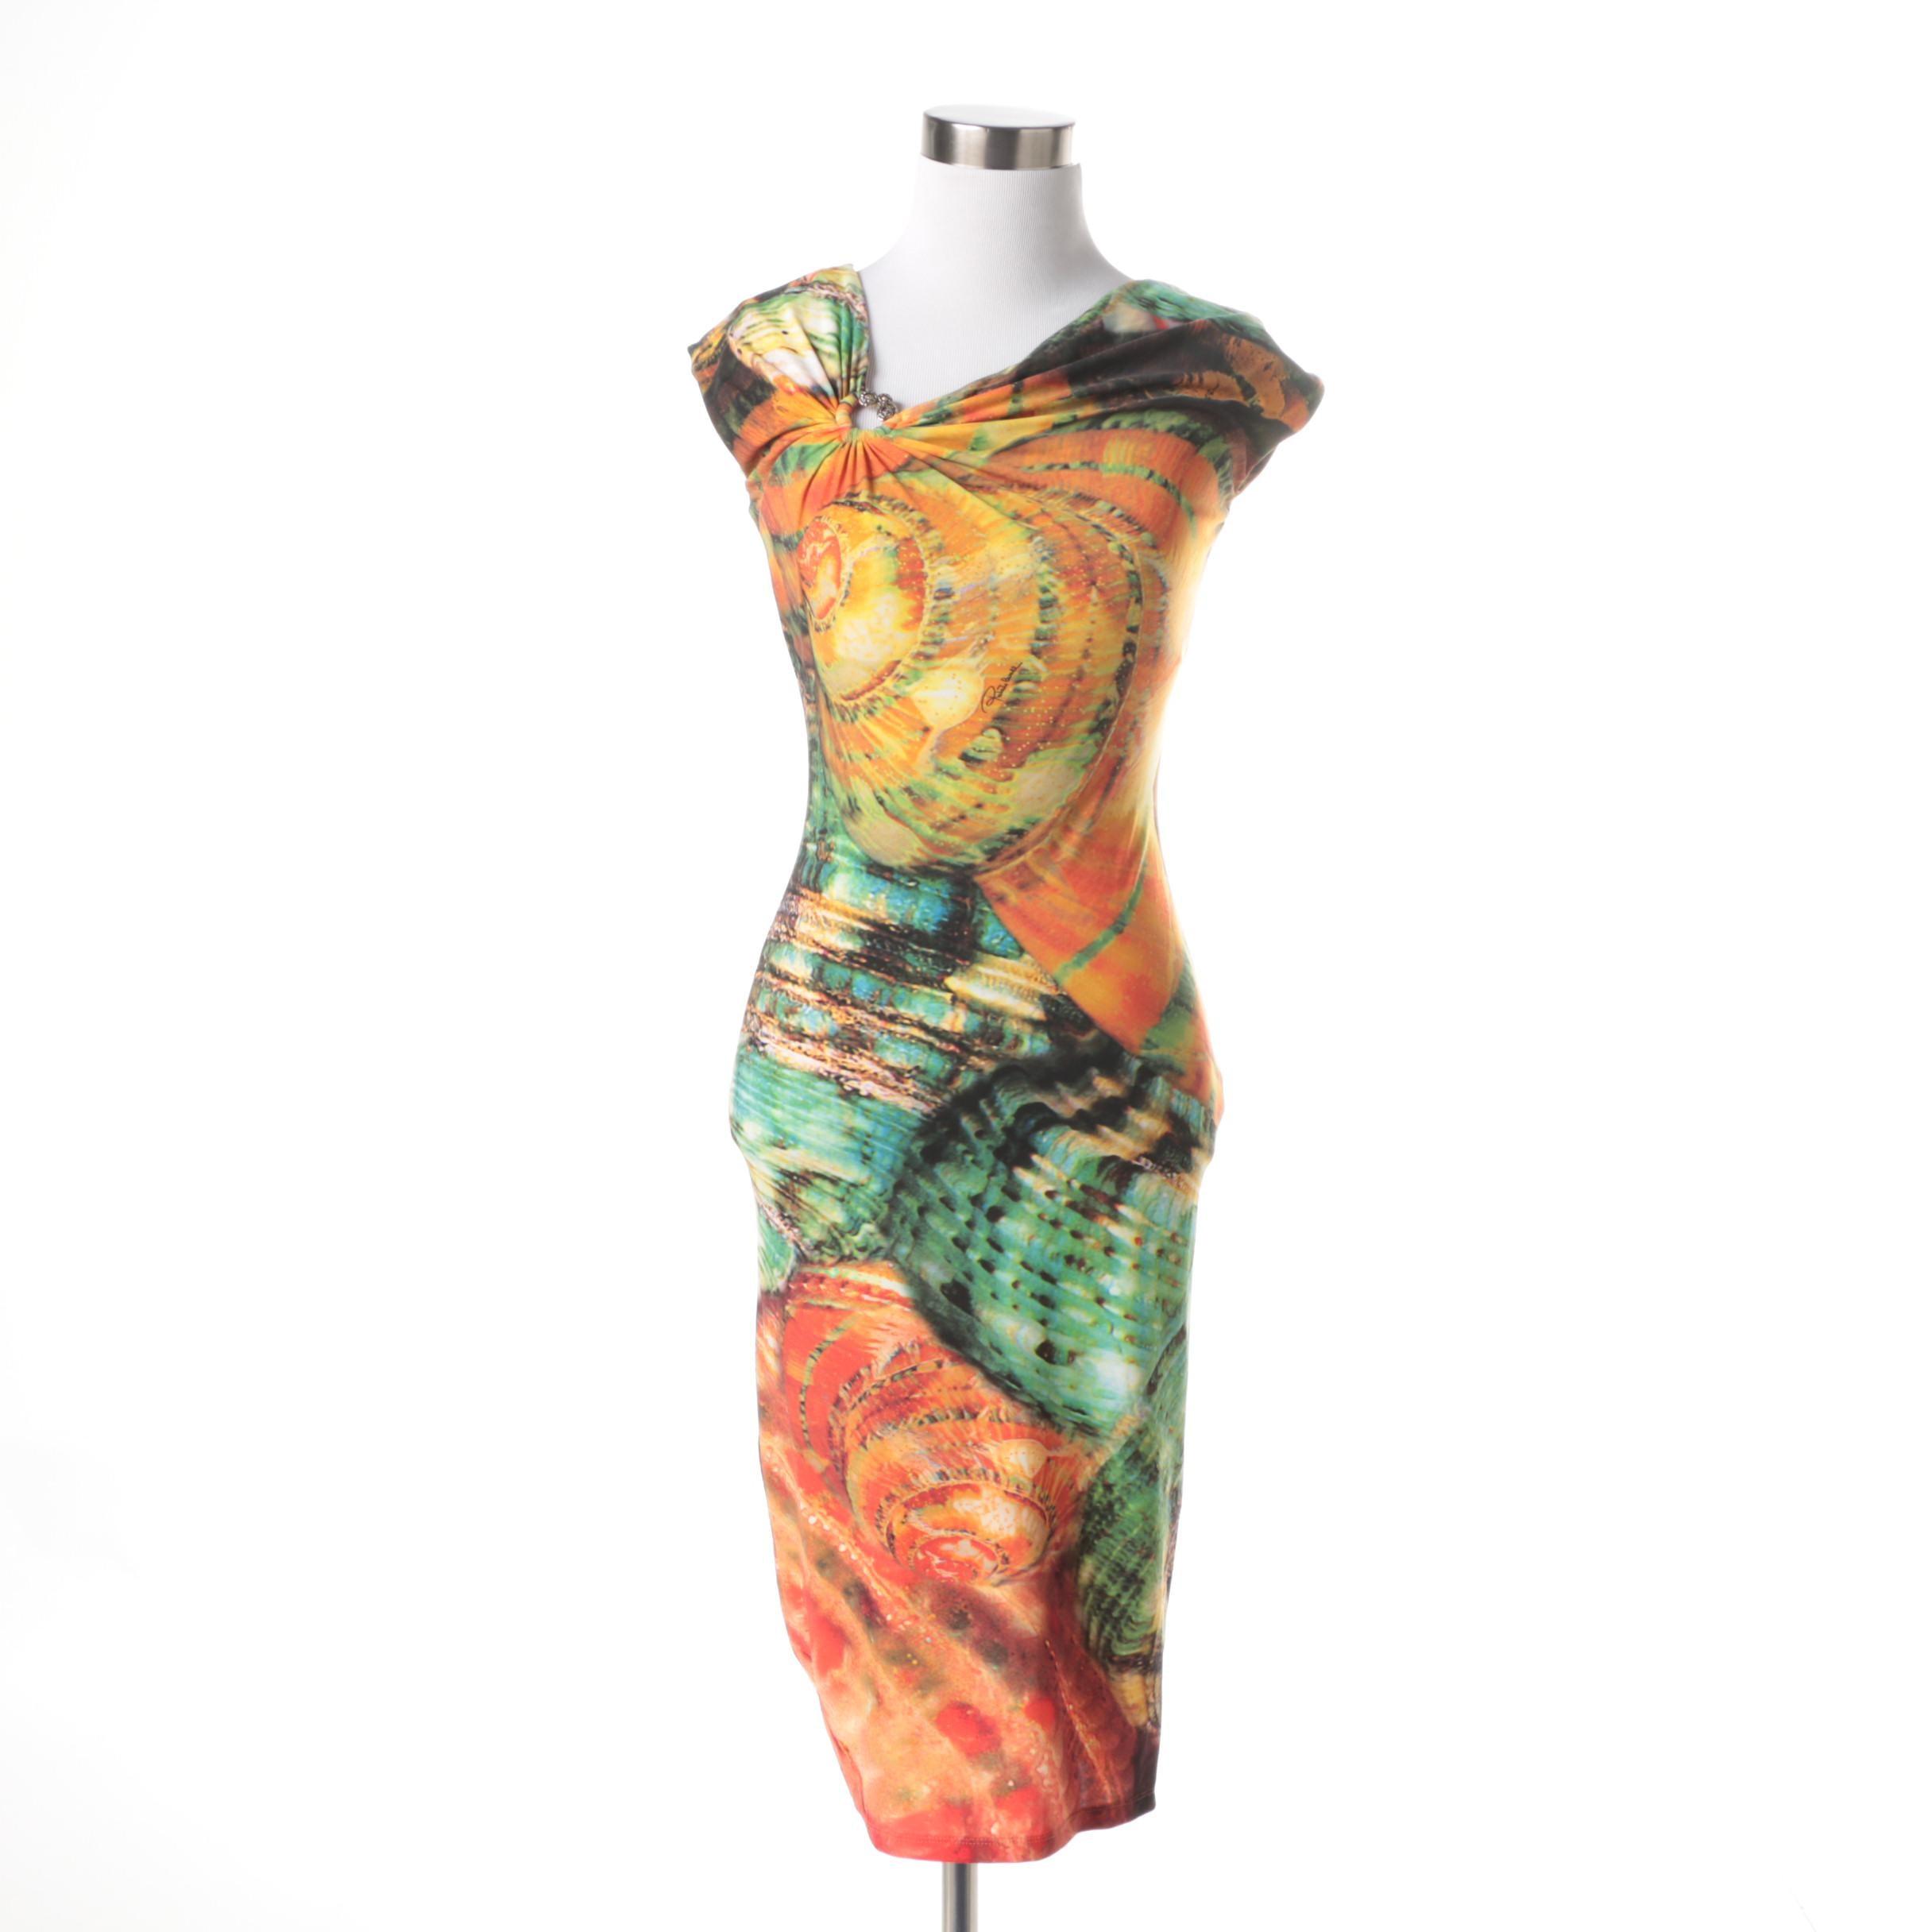 Roberto Cavalli Painterly Bodycon Dress